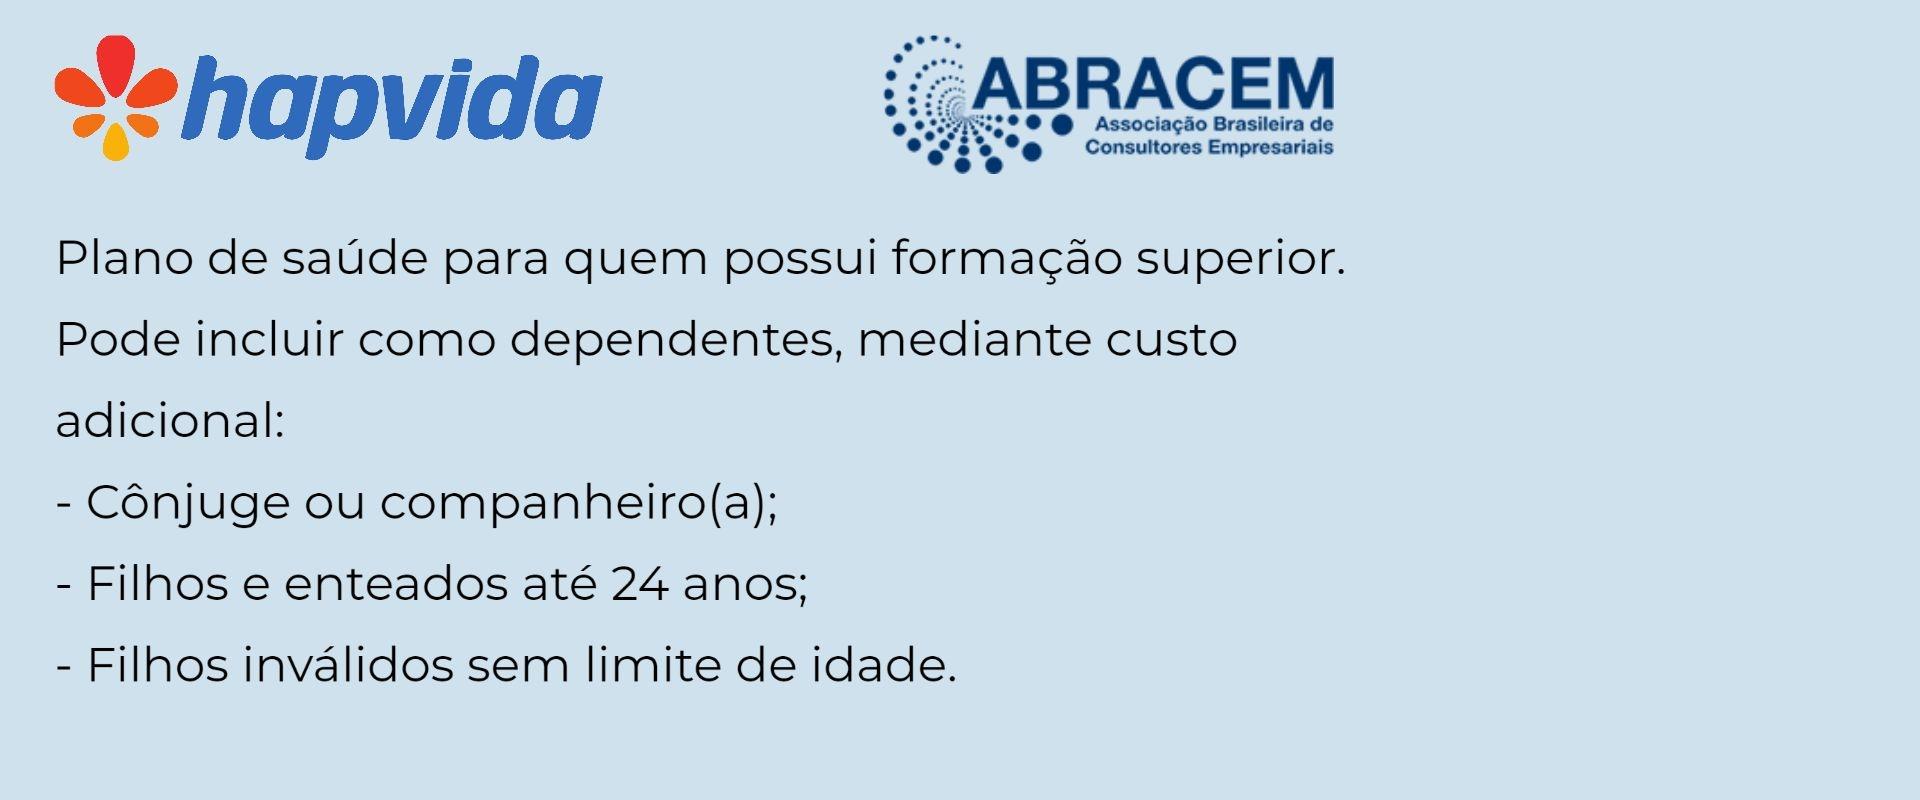 Hapvida Abracem-AM